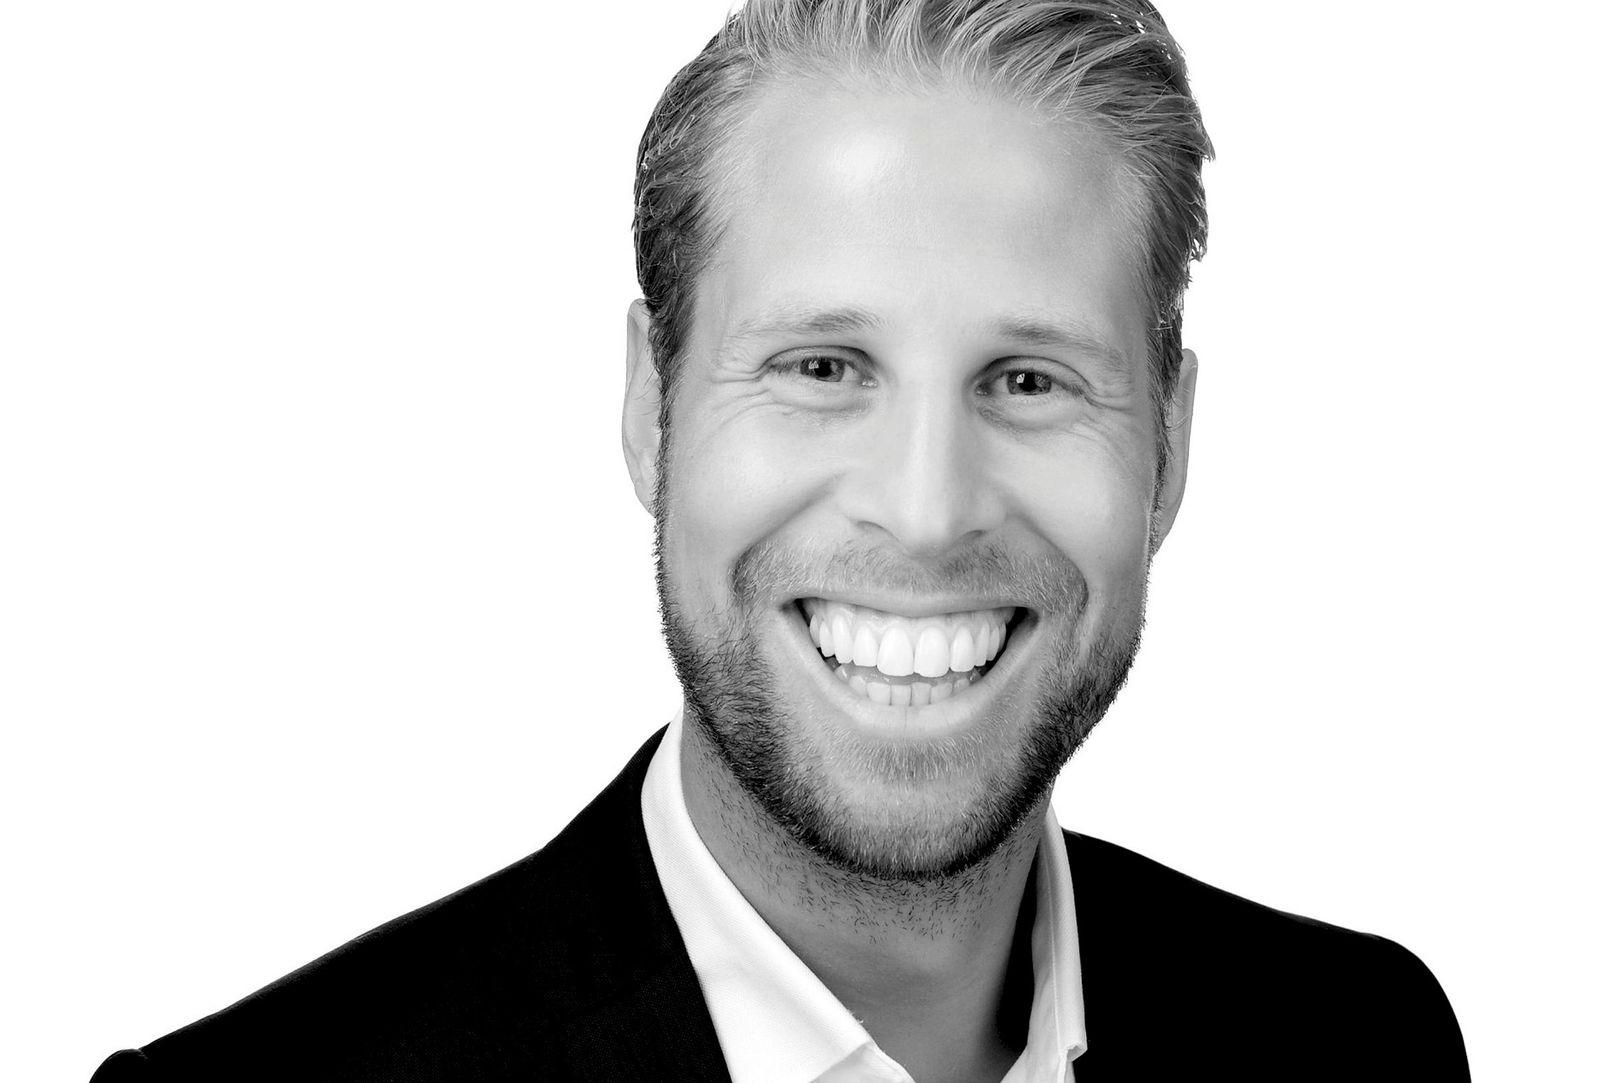 Vemund V. Thorkildsen, Eiendomsmegler MNEF/Partner hos Nordvik.